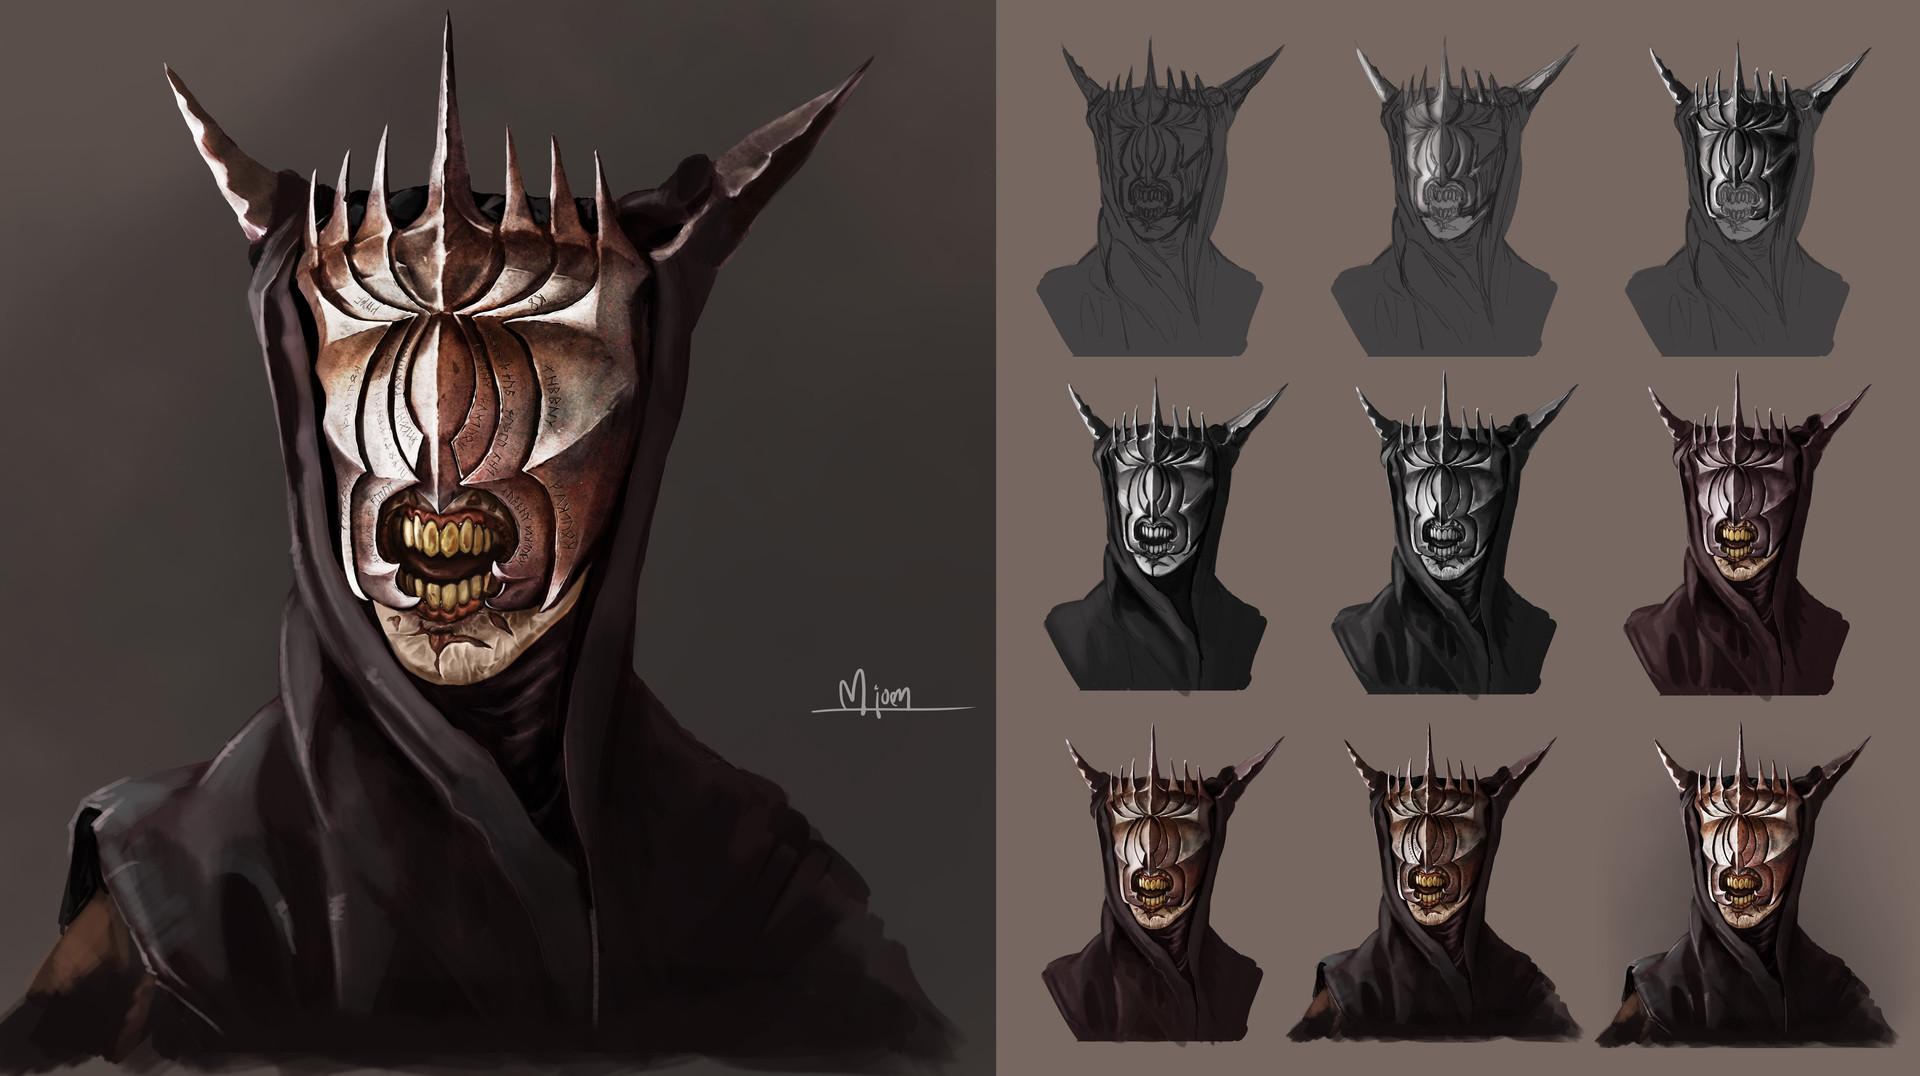 Kyle mjoen mouth of sauron study